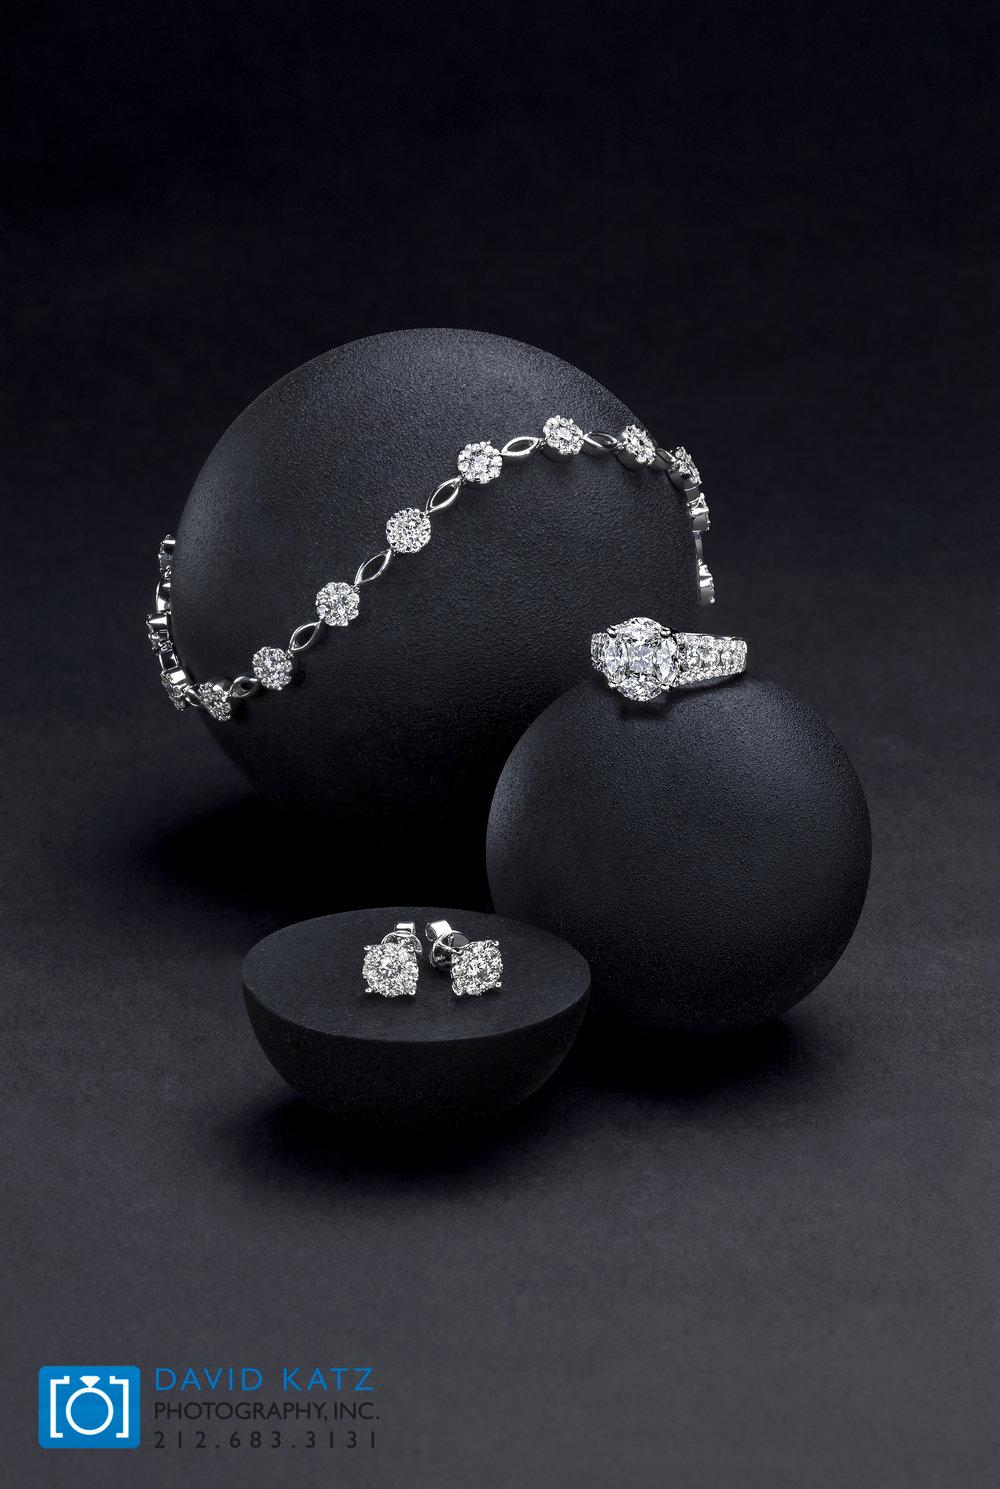 Earring RIng Bracelet Jewelry Lifestyle Group on Balls.jpg